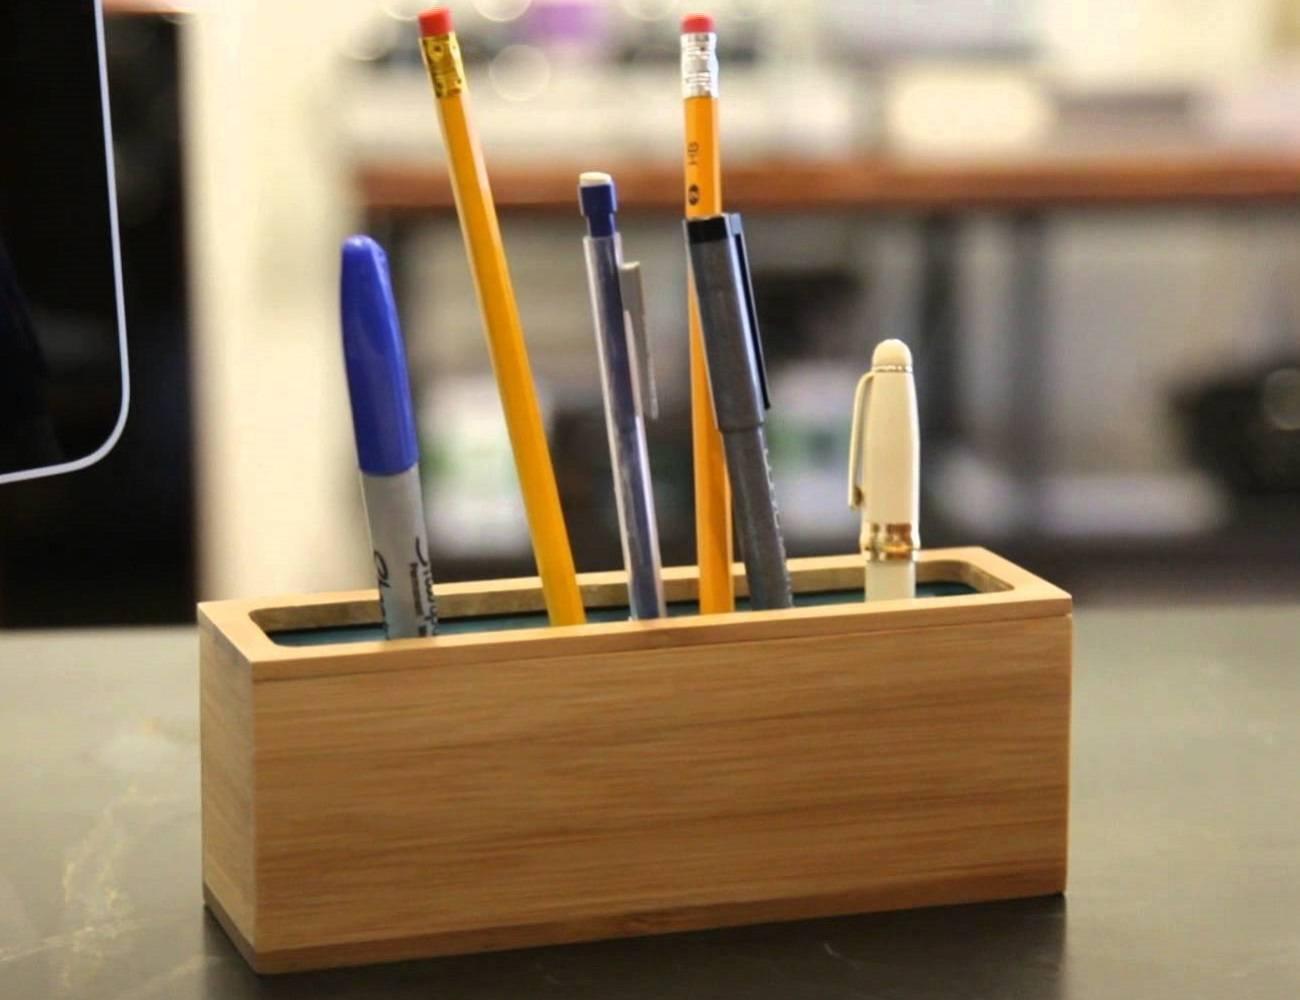 Pen Zen The Art of Organization